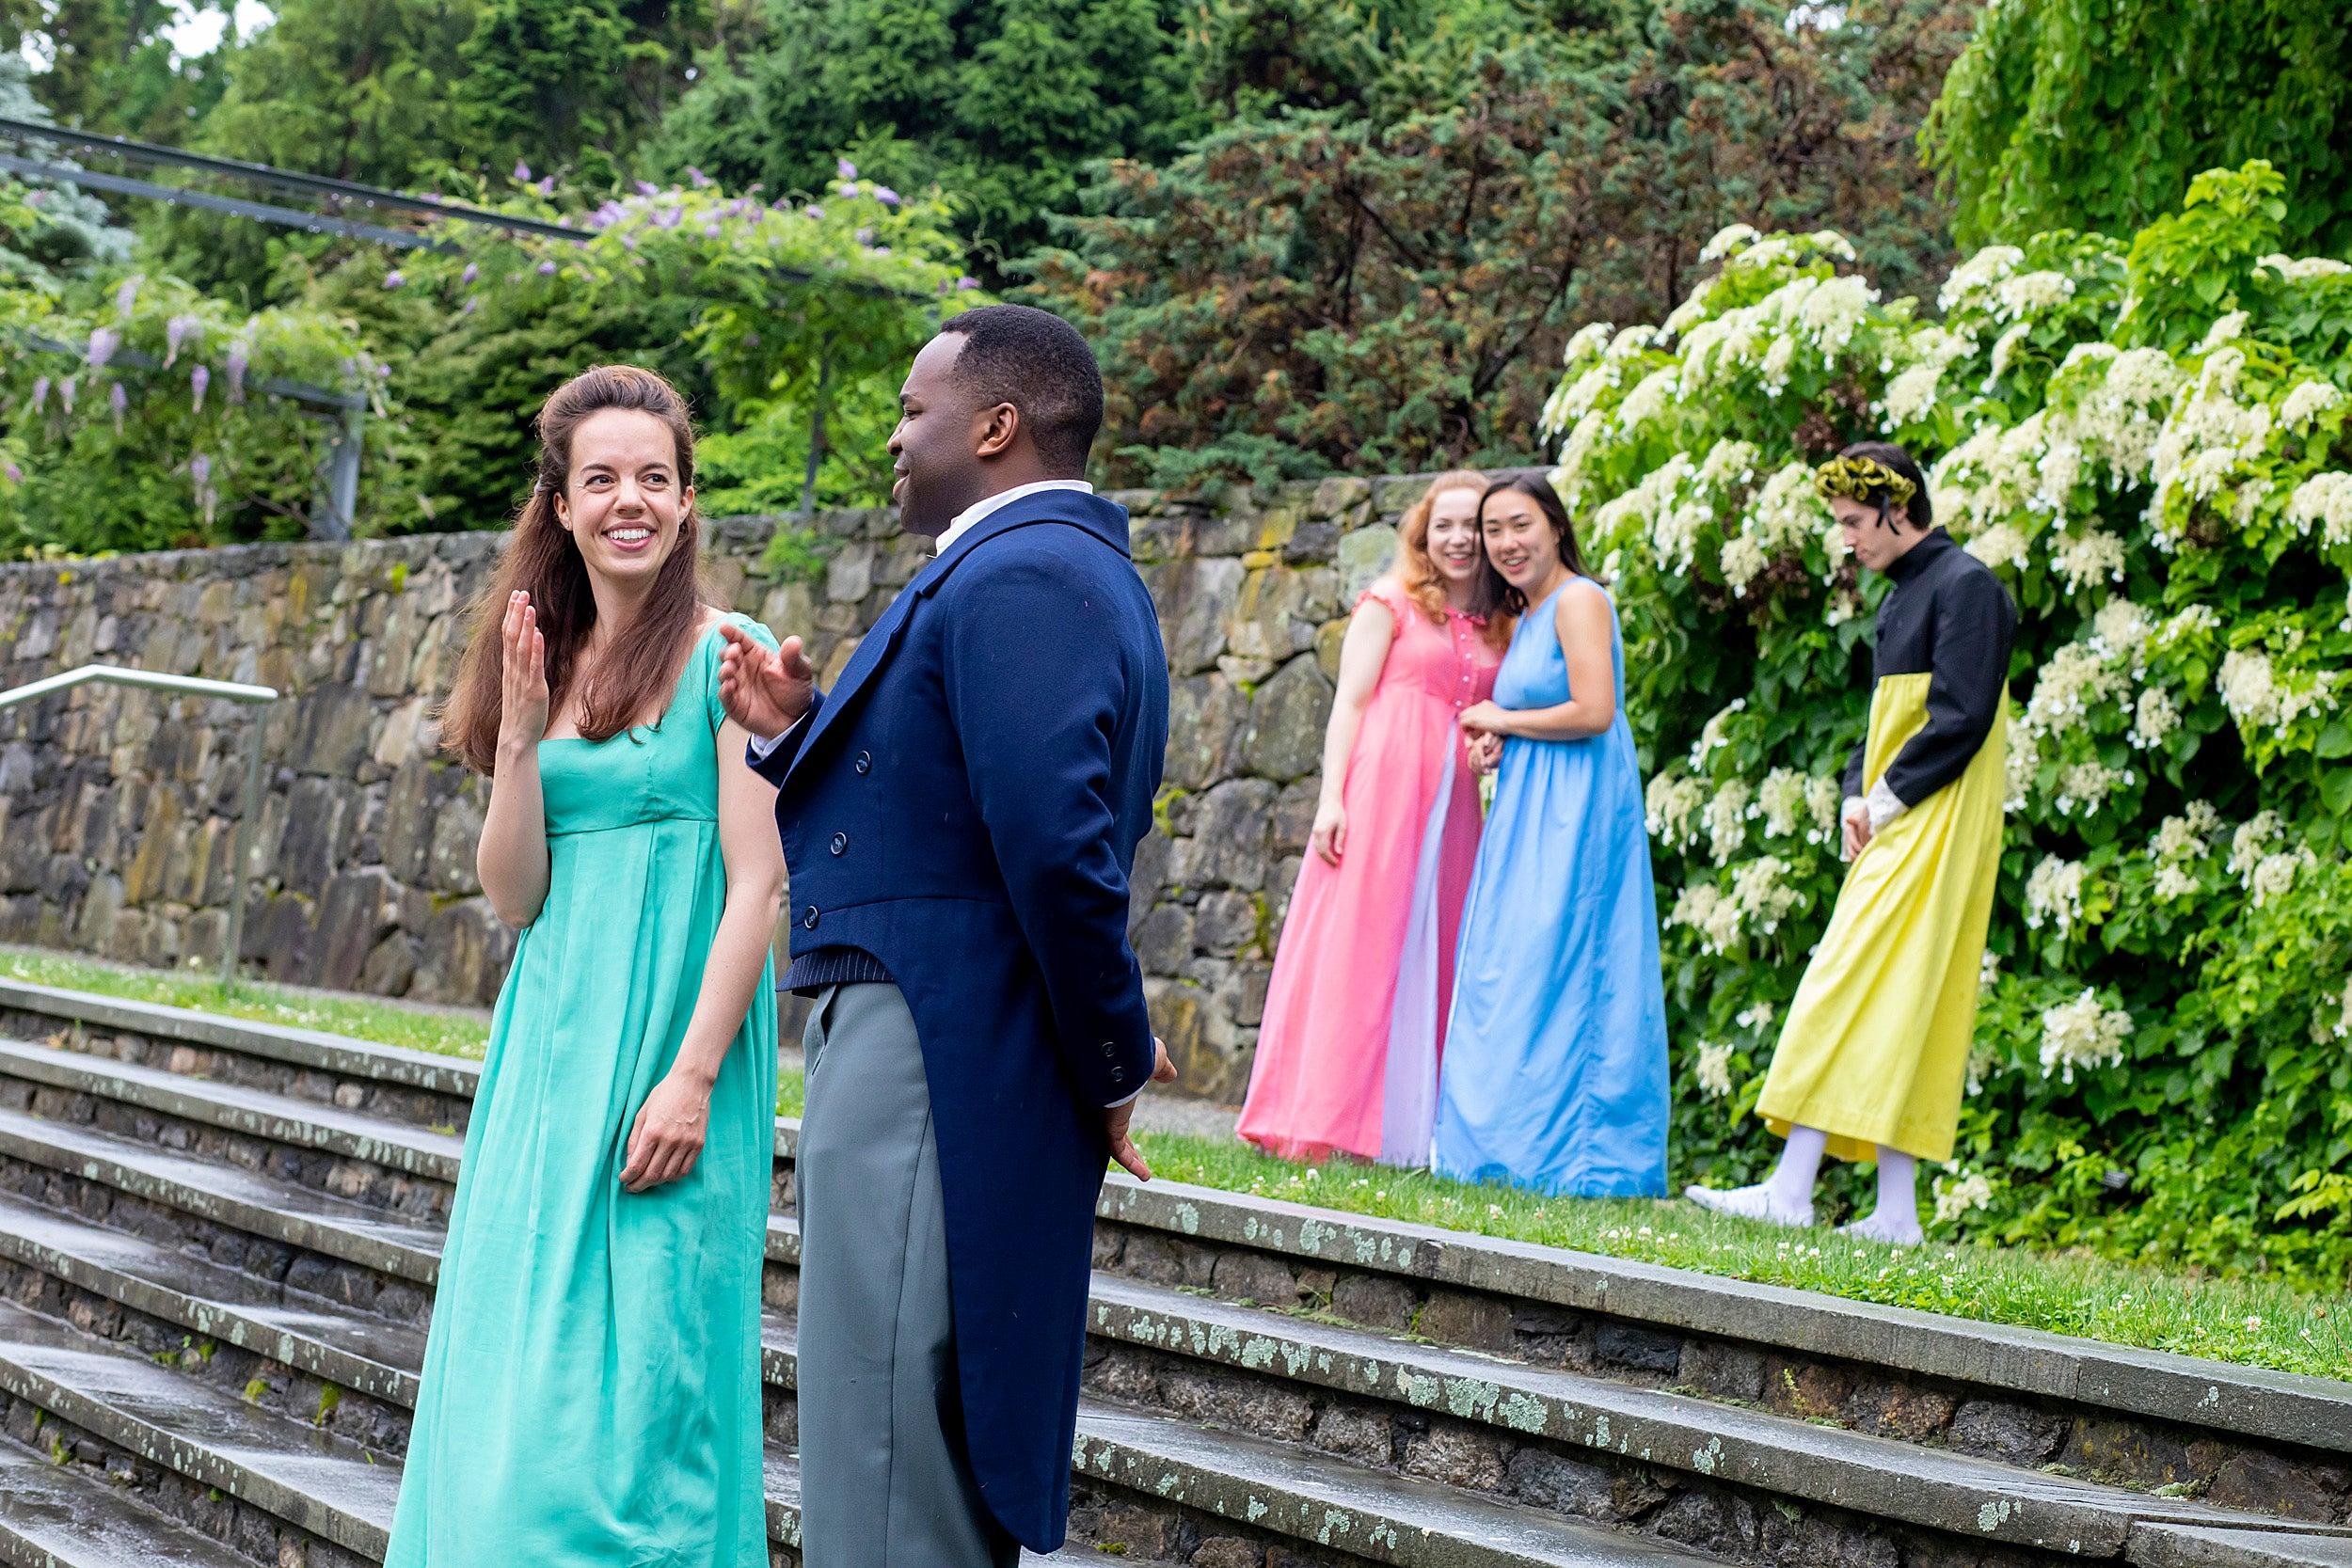 the cast of pride and prejudice rehearses in the Arboretum